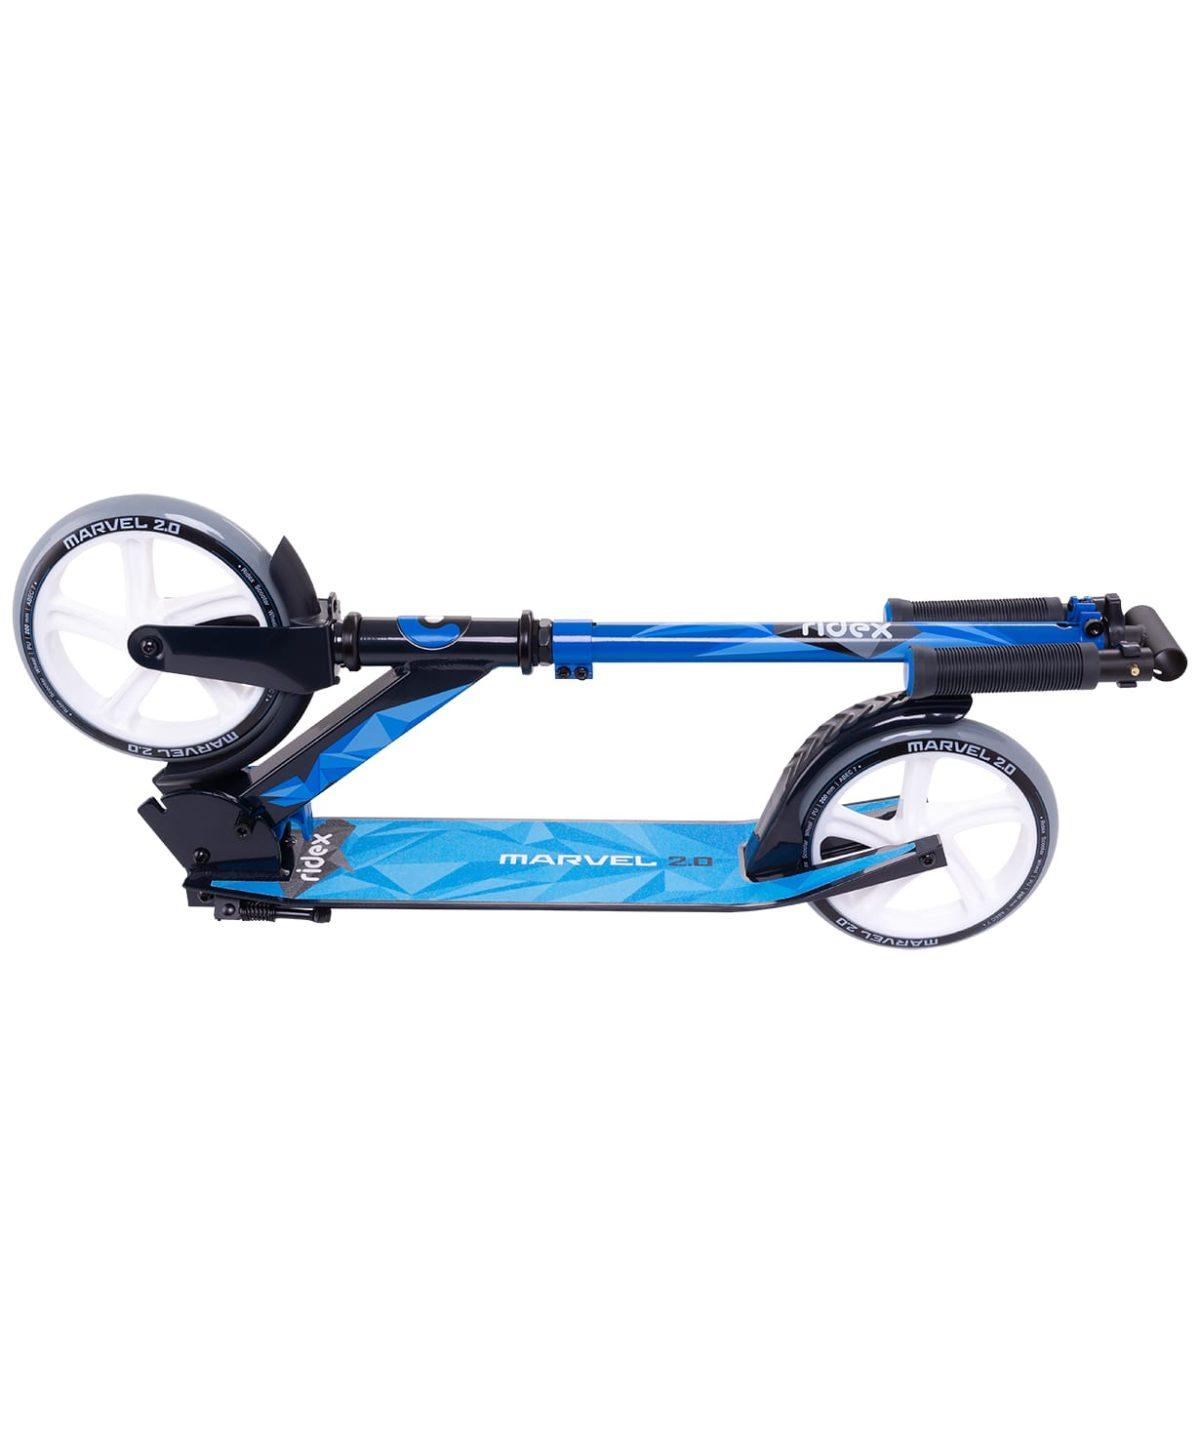 RIDEX Marvel Самокат 2-х колесныйи 200 мм  Marvel: синий/черный - 5